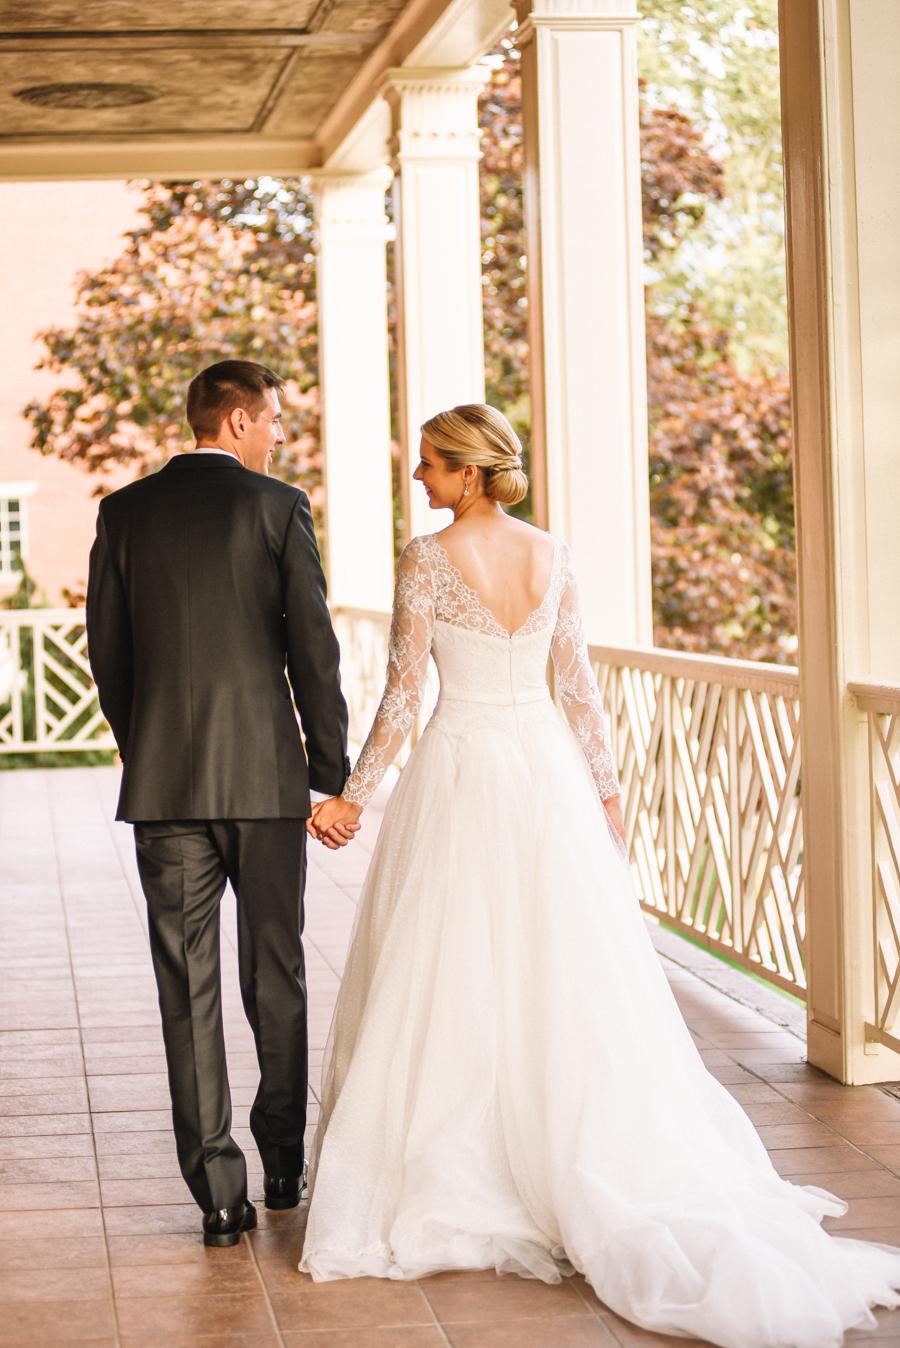 Henry_Ford__Lovett_Hall_Wedding_Detroit-45.jpg